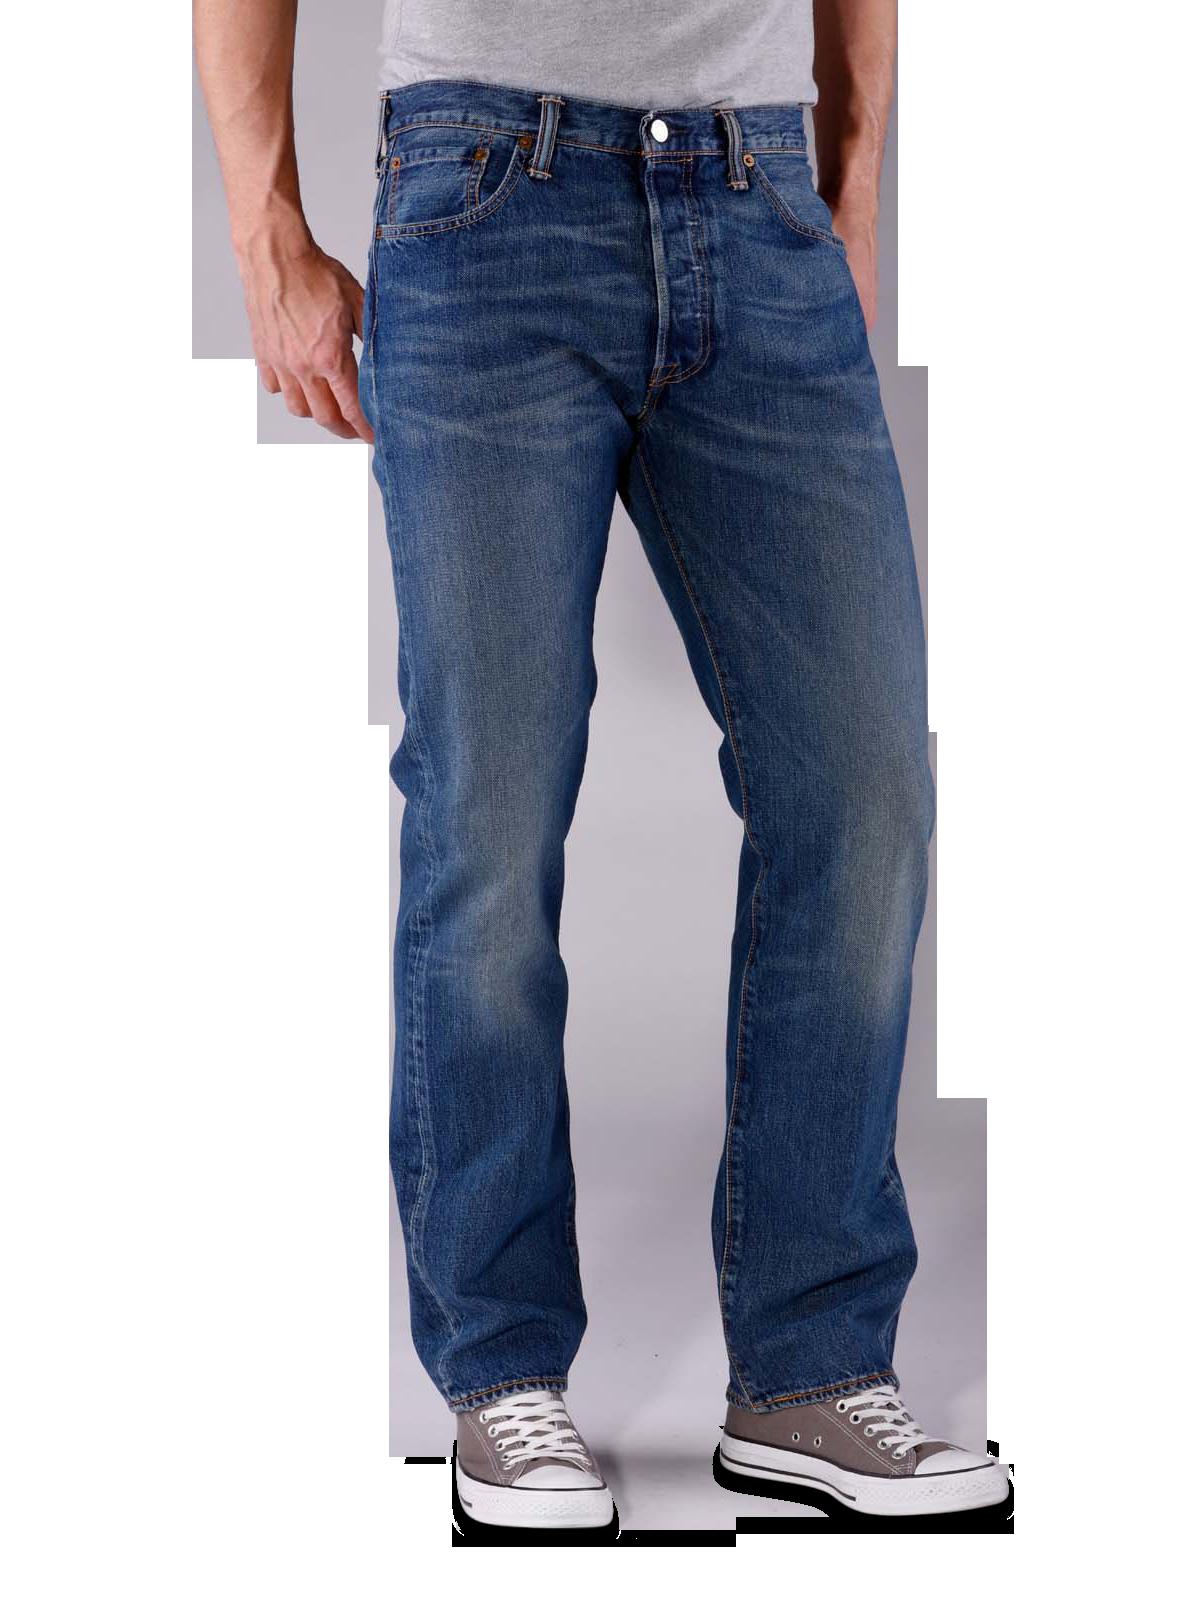 Levi's 501 Jeans hook   Gratis Lieferung - JEANS.CH - Levi Strauss 501 Jeans